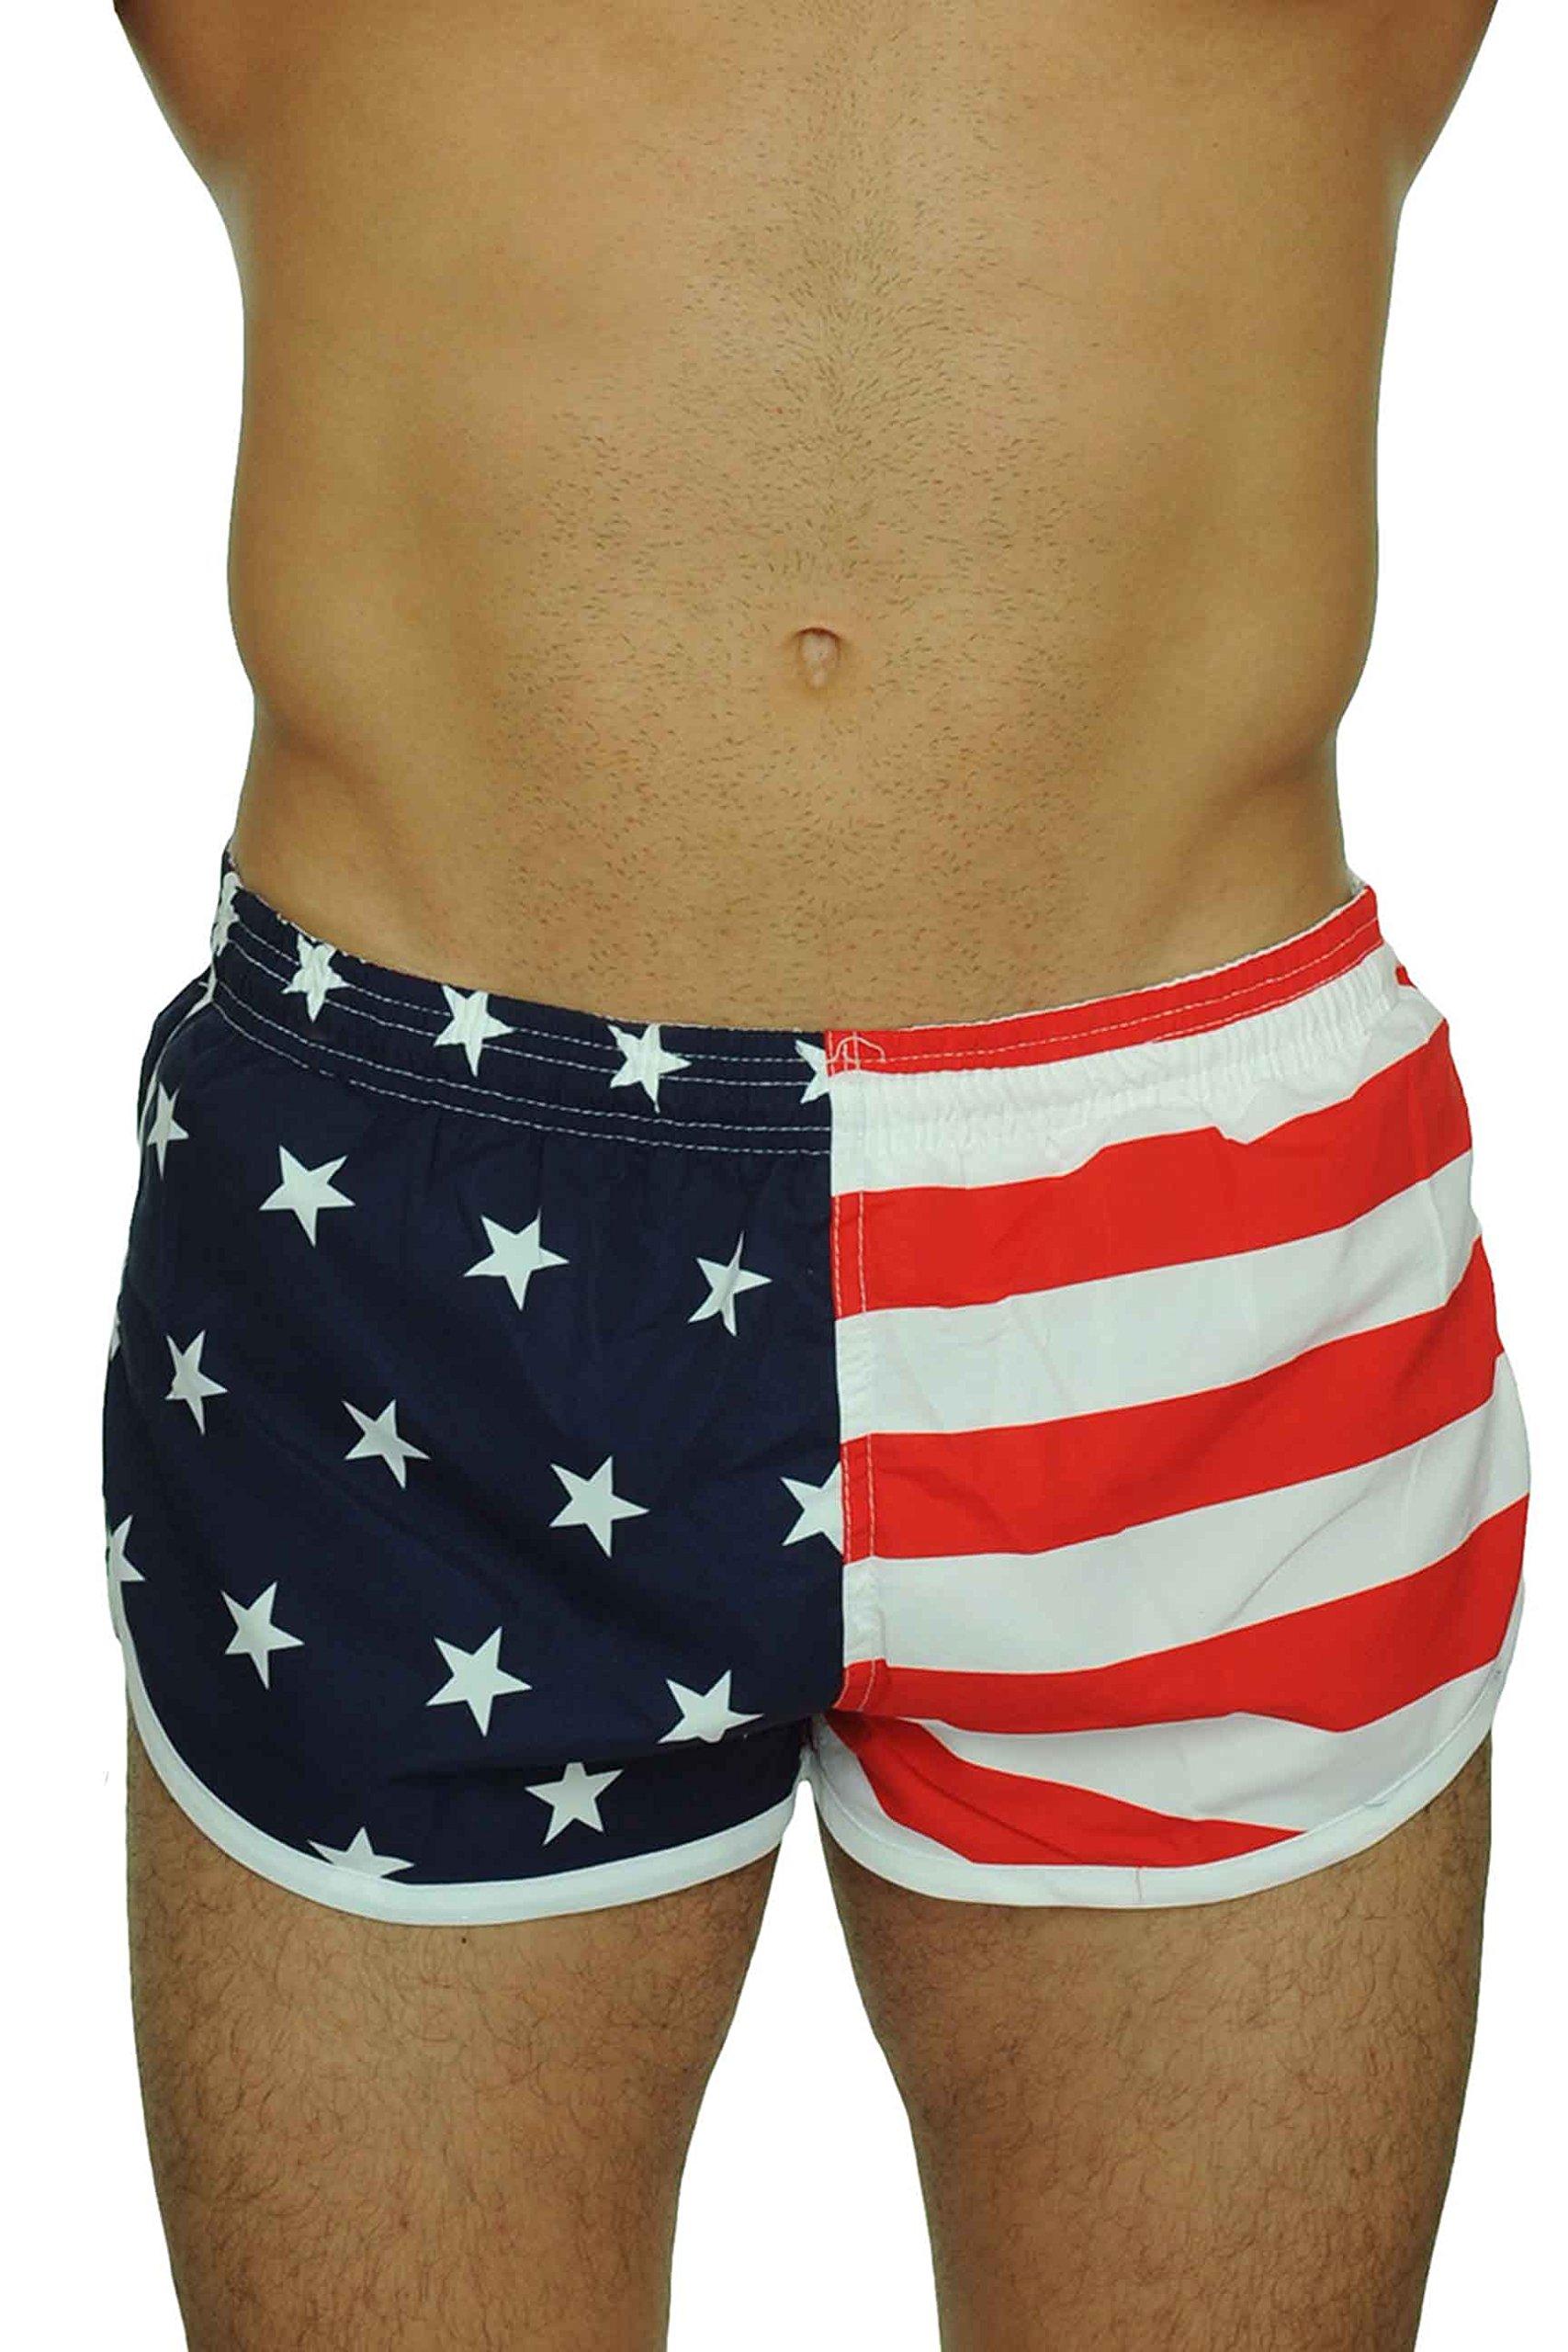 UZZI Men's Running Shorts Swimwear Trunks 1830, American Flag, X-Large by UZZI